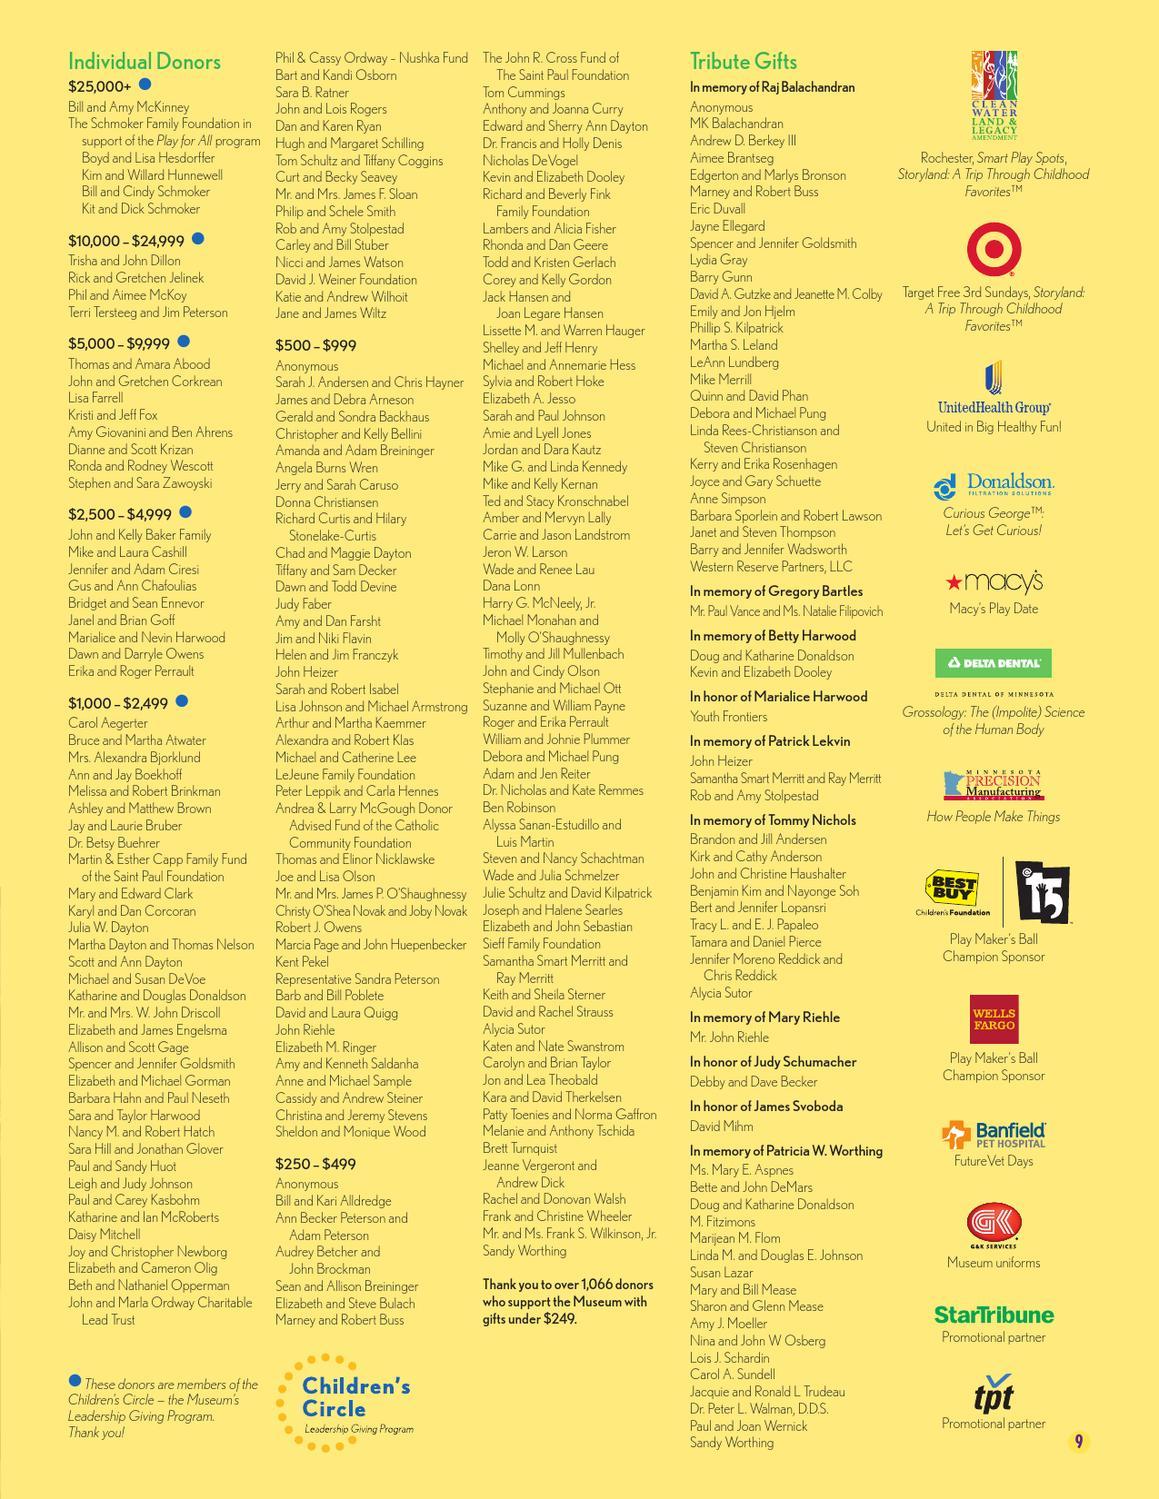 Minnesota Children's Museum Annual Report 2012 by J Wilson